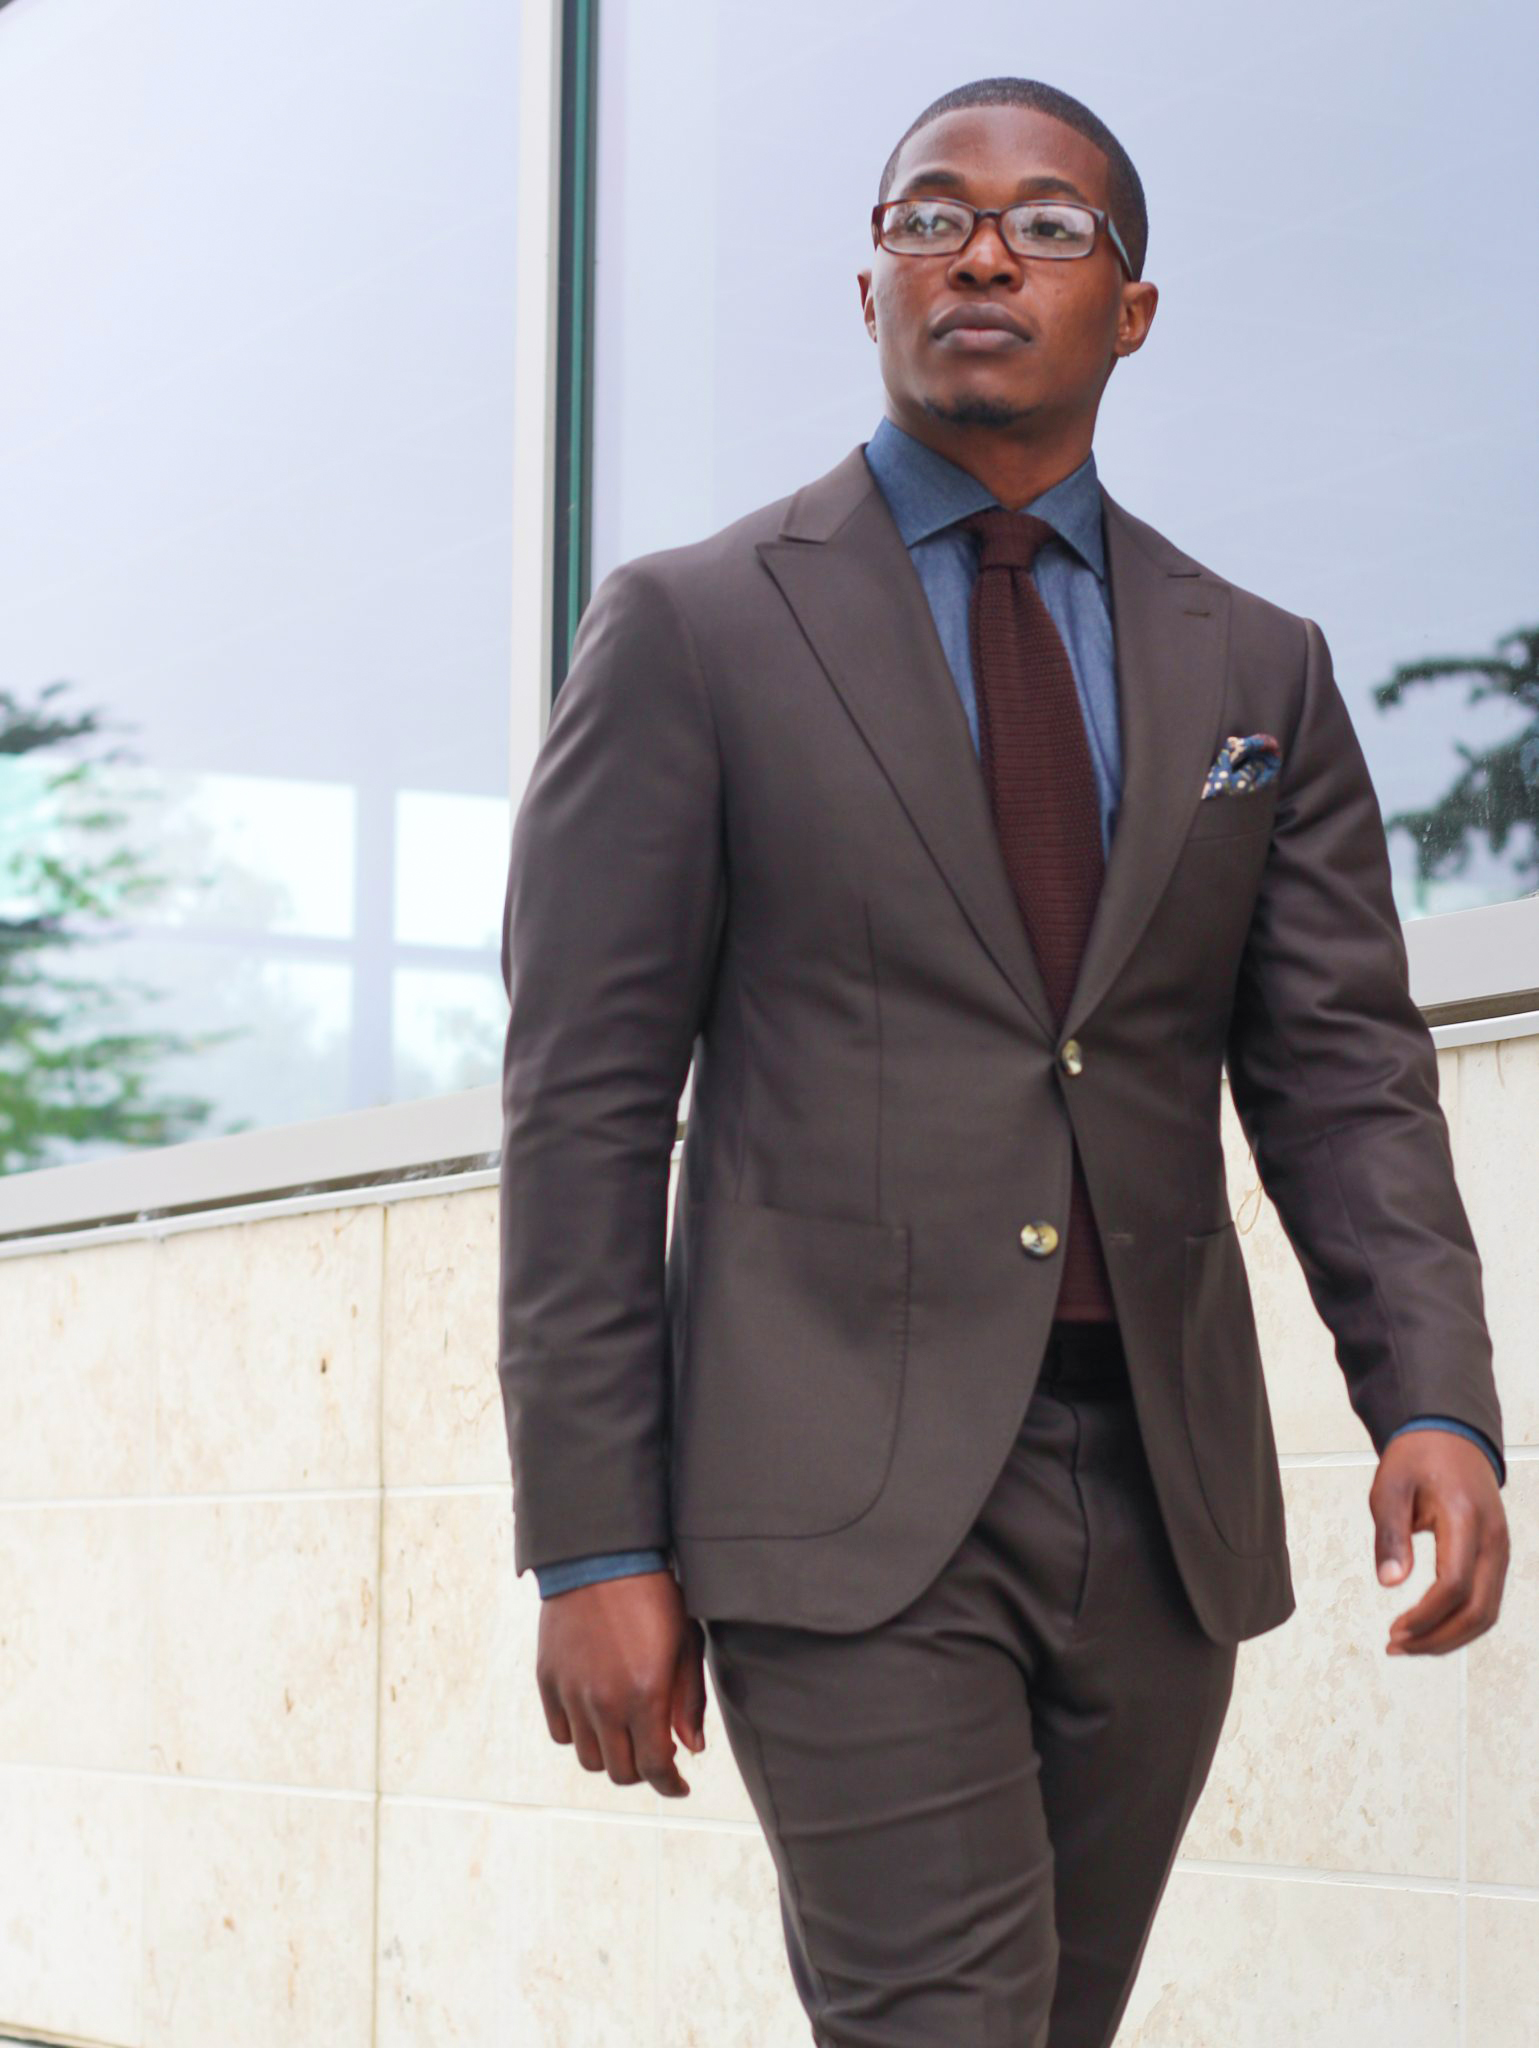 dark brown suit, navy shirt and burgundy tie color combination